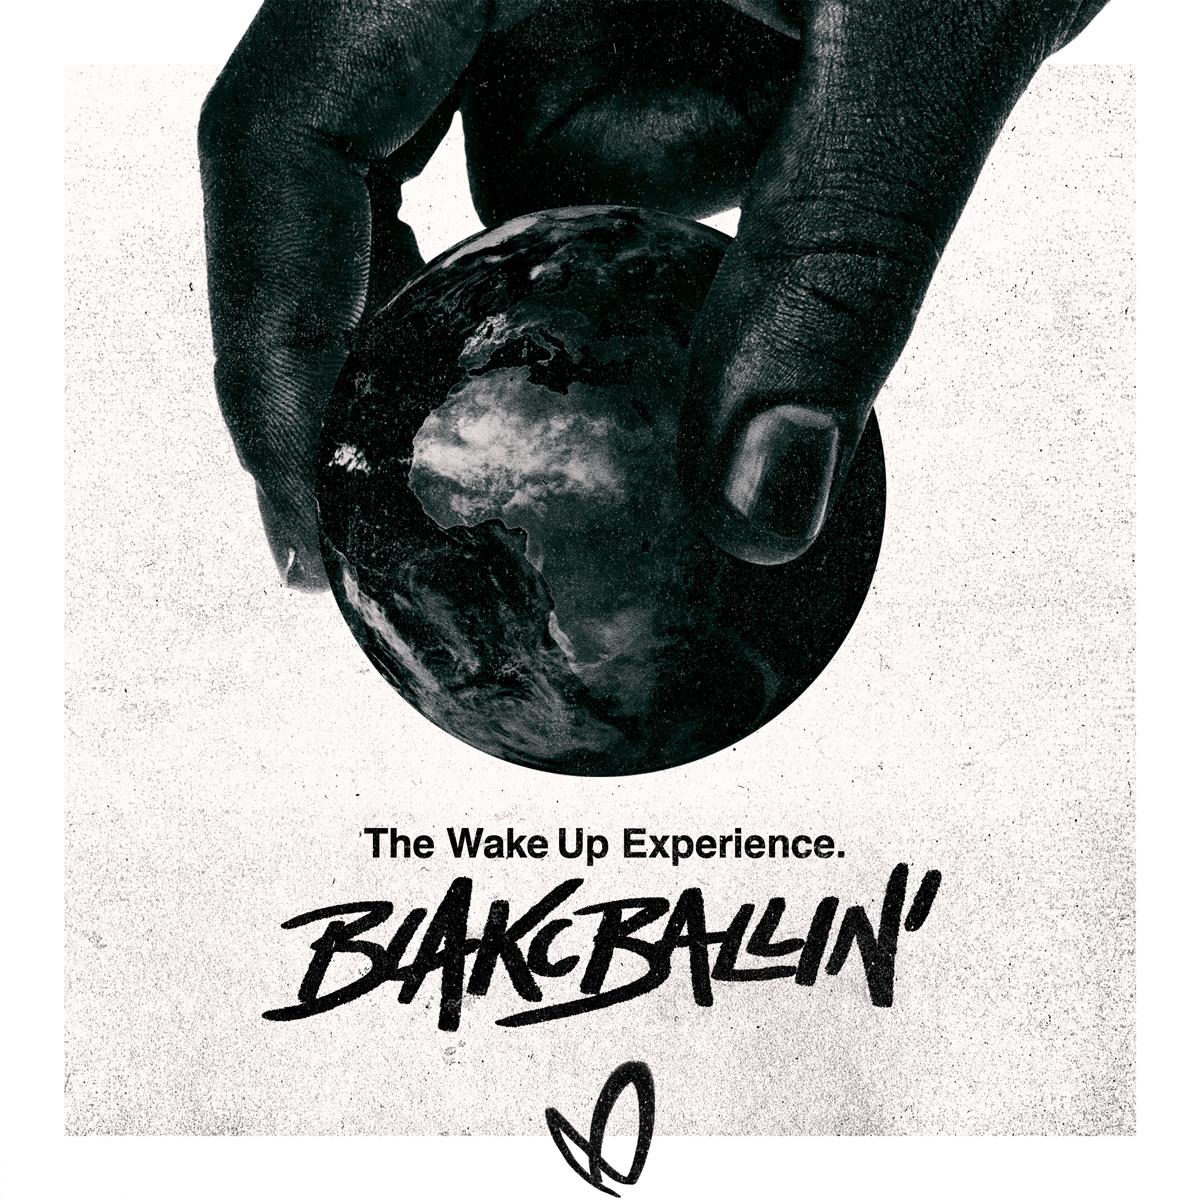 Blakc Ballin single artwork